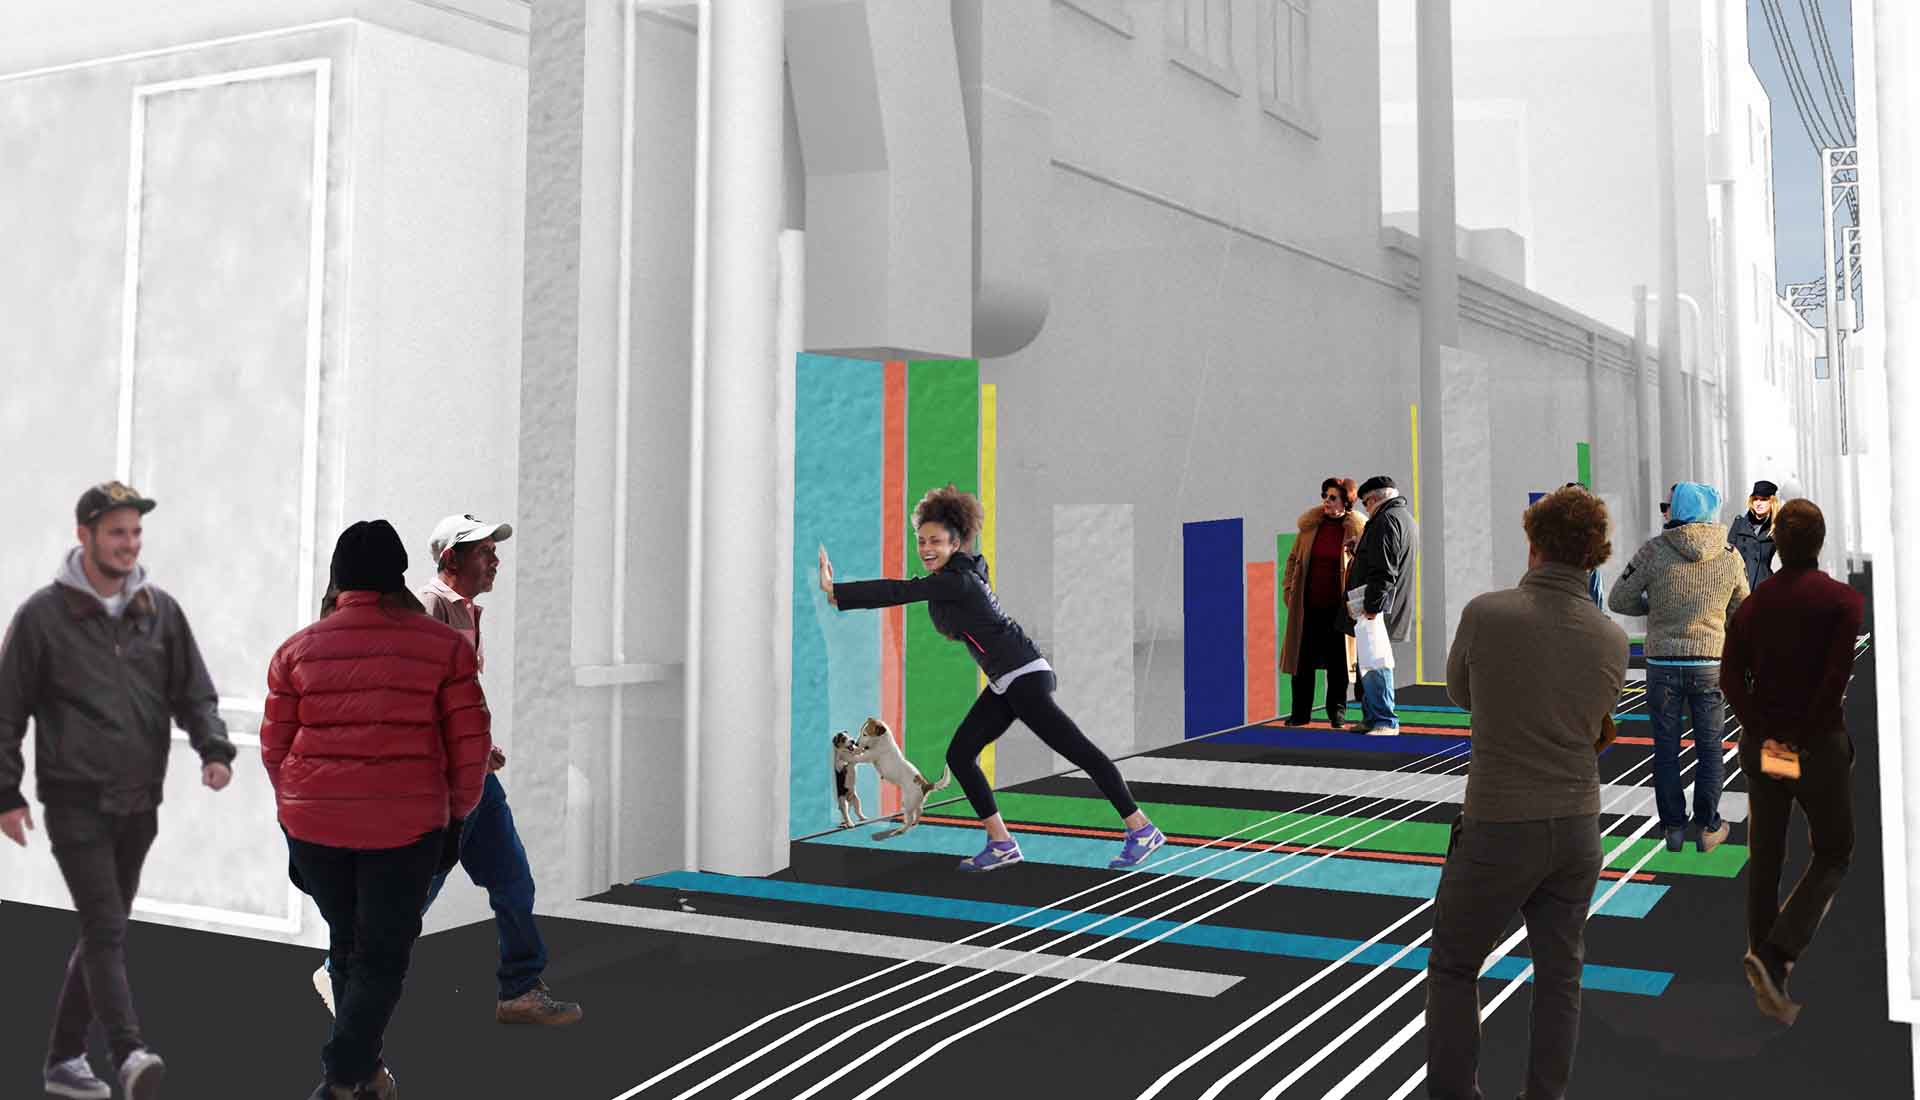 Arbolope Studio | Landscape Architects + Urban Designers | The Score